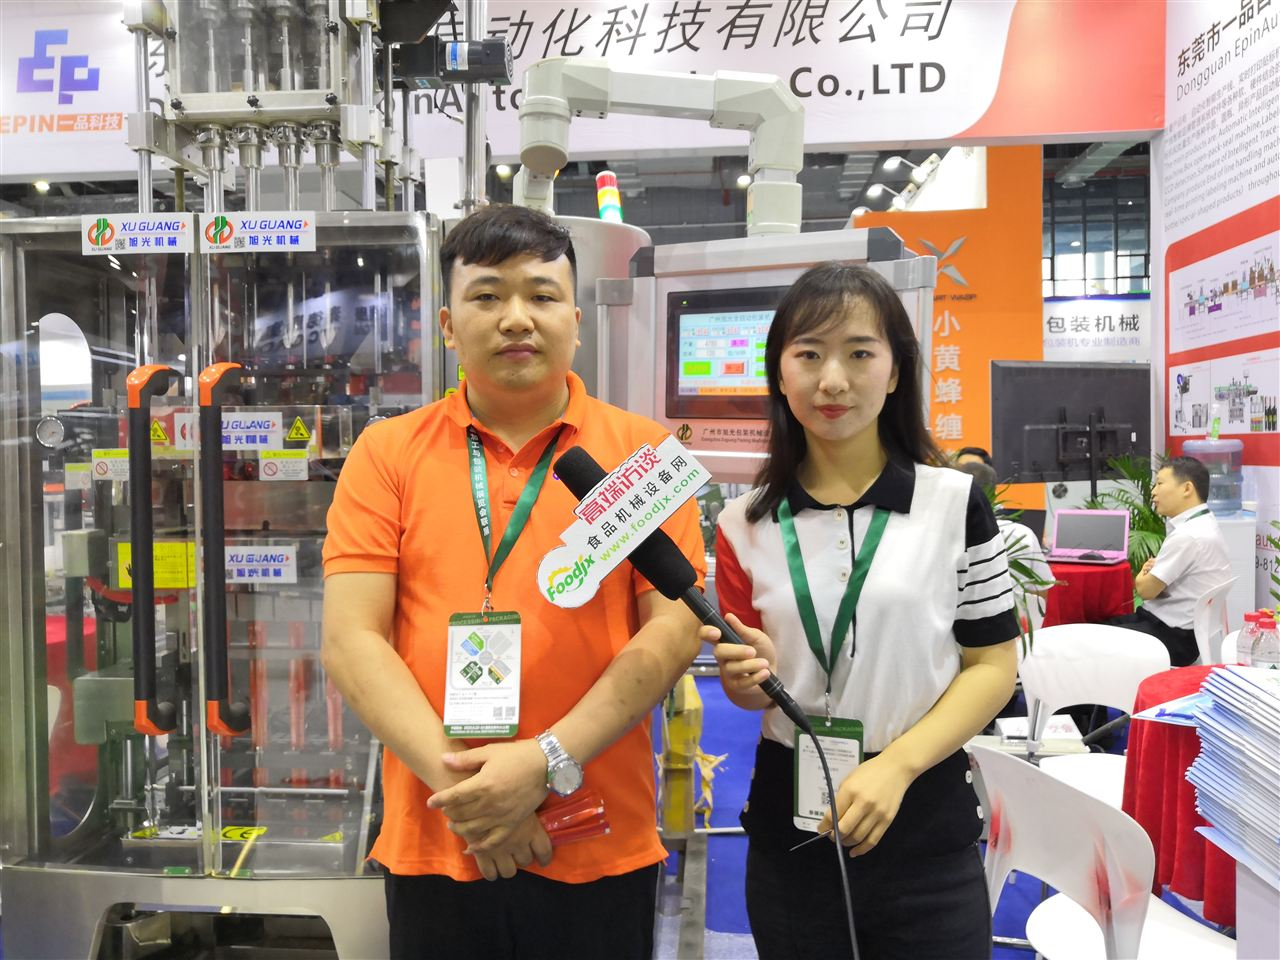 foodjx专访广州市旭光包装机械设备有限公司